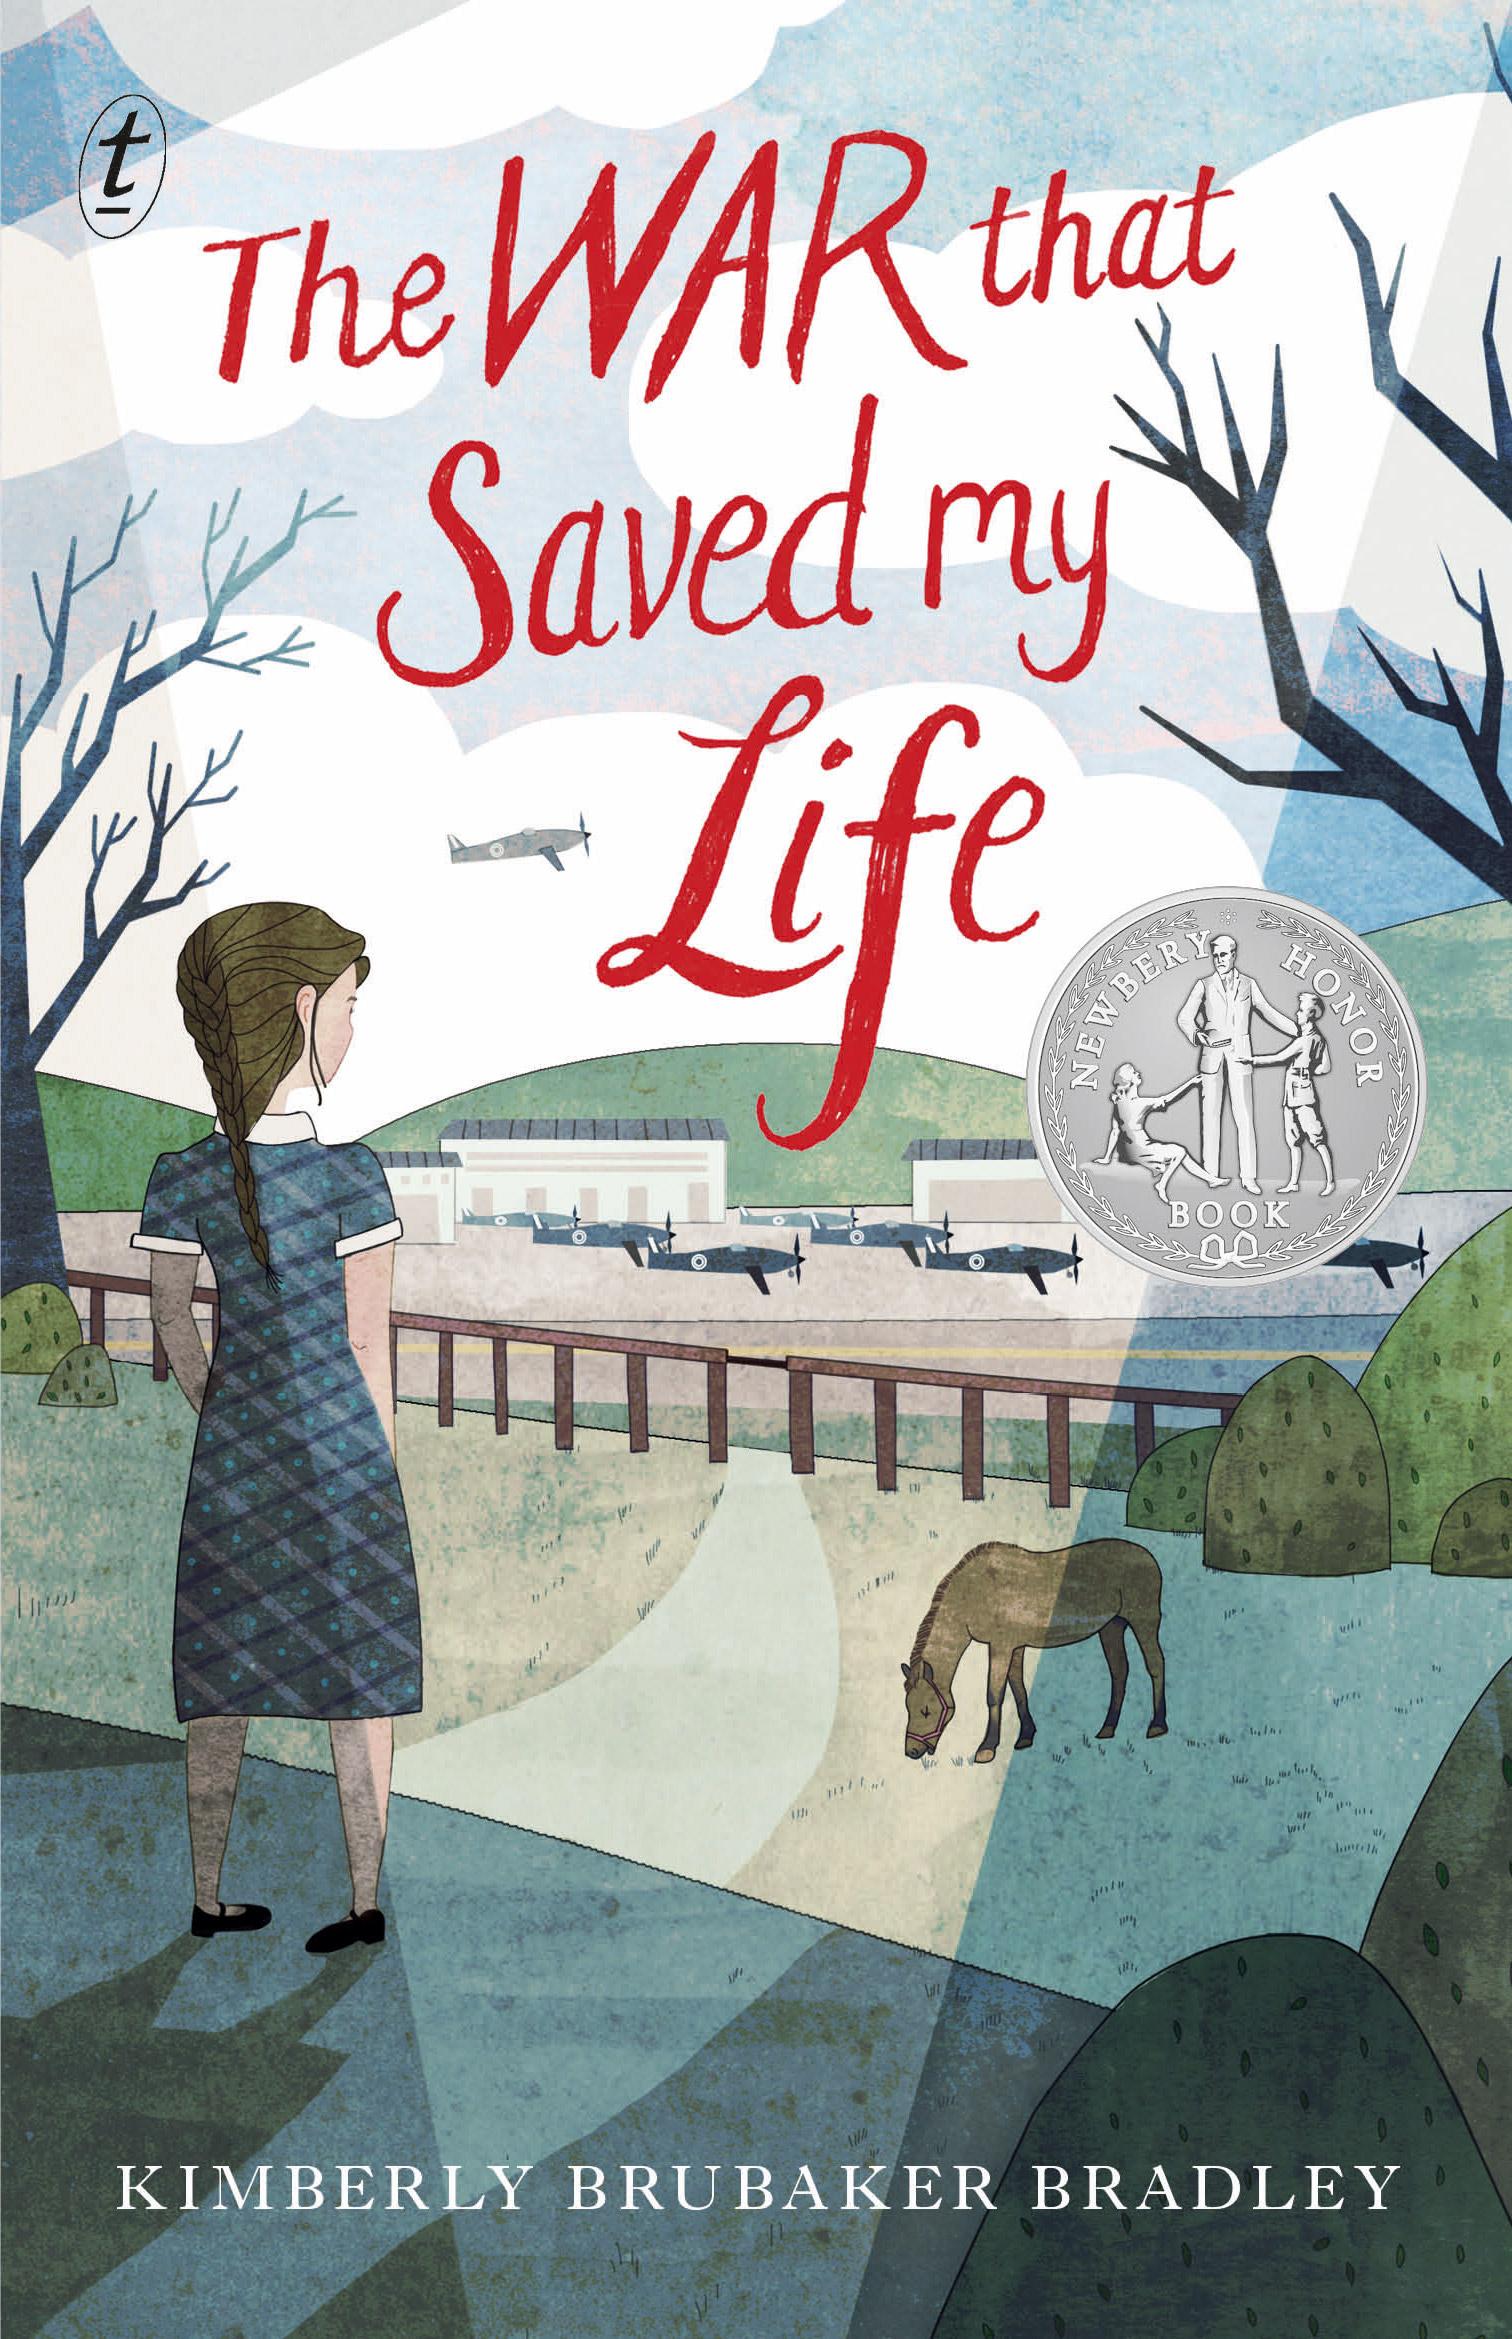 The War That Saved My Life by Kimberley Brubaker Bradley